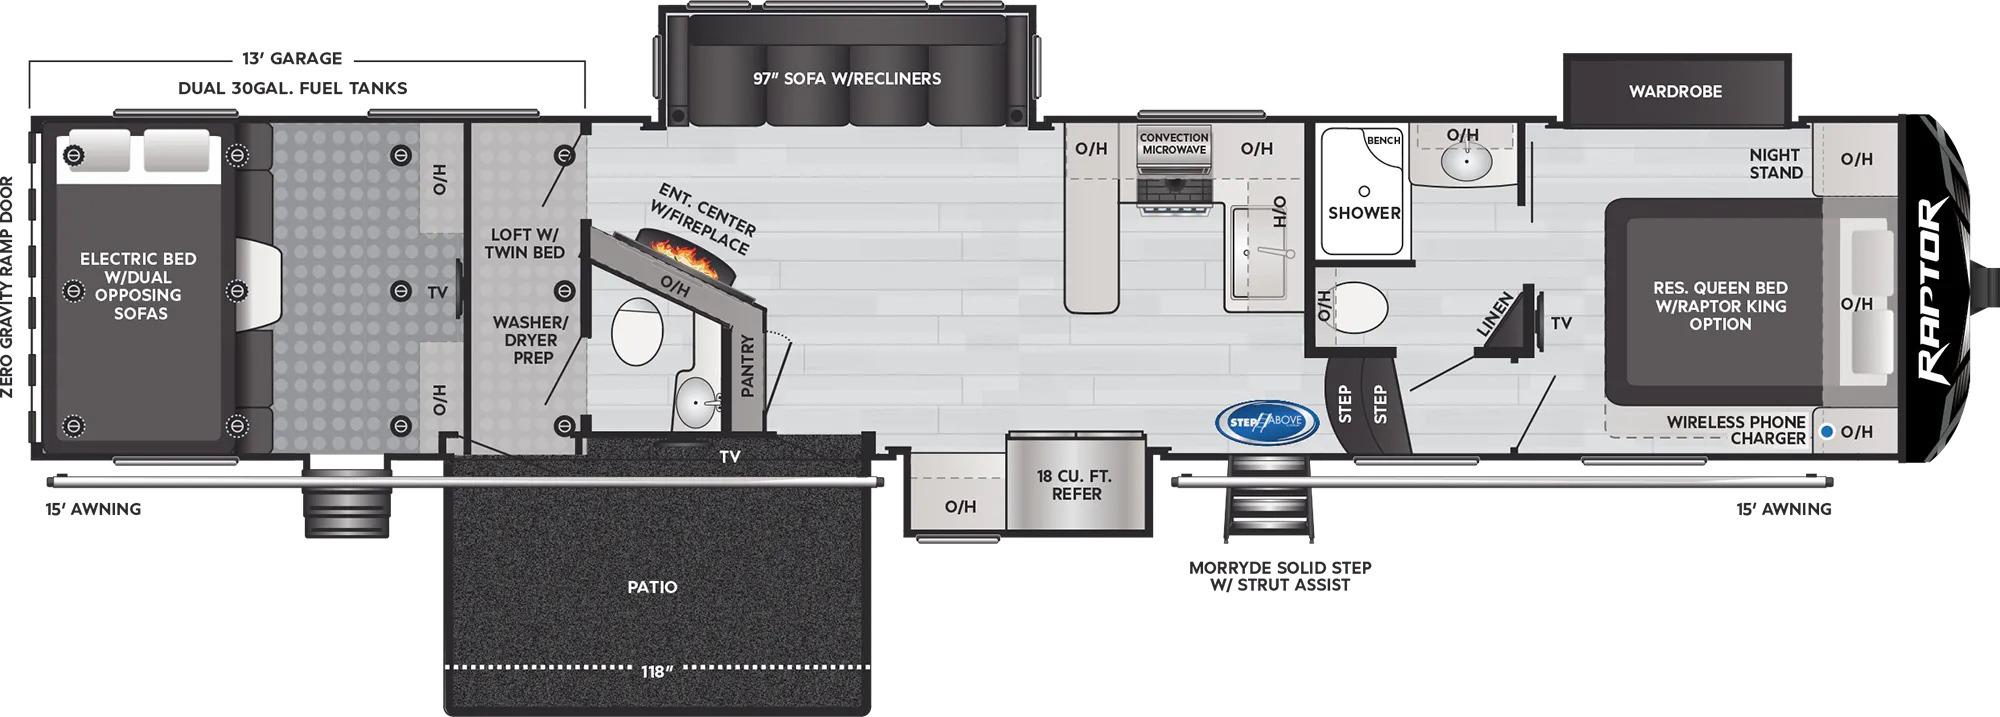 View Floor Plan for 2022 KEYSTONE RAPTOR 429